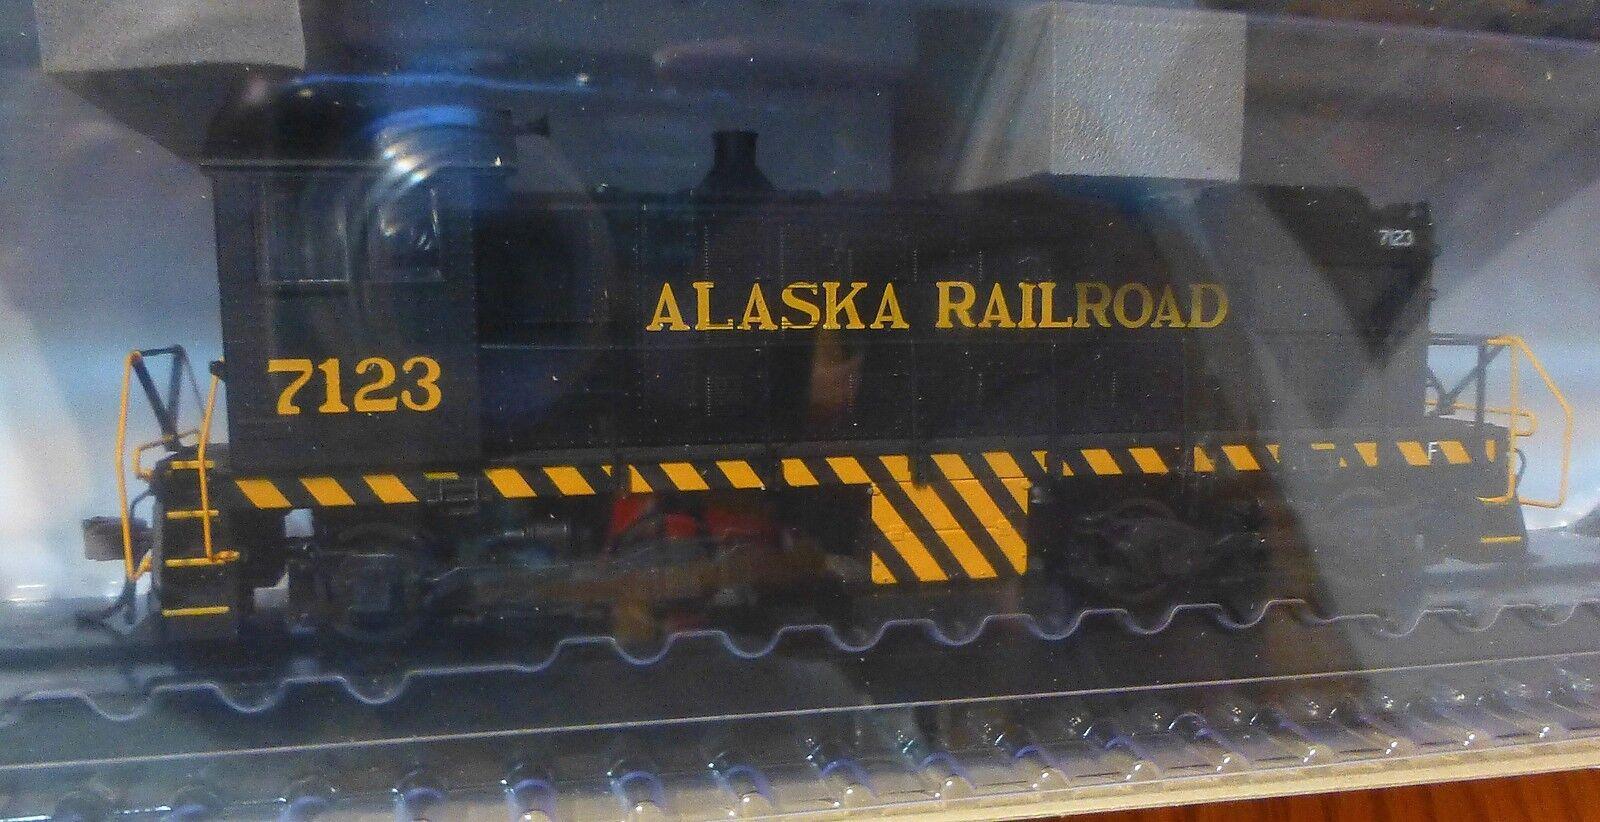 Atlas HO  10001908 Alaska Railroad Rd  7123 Alco S-2 w/DCC & Lok Sound